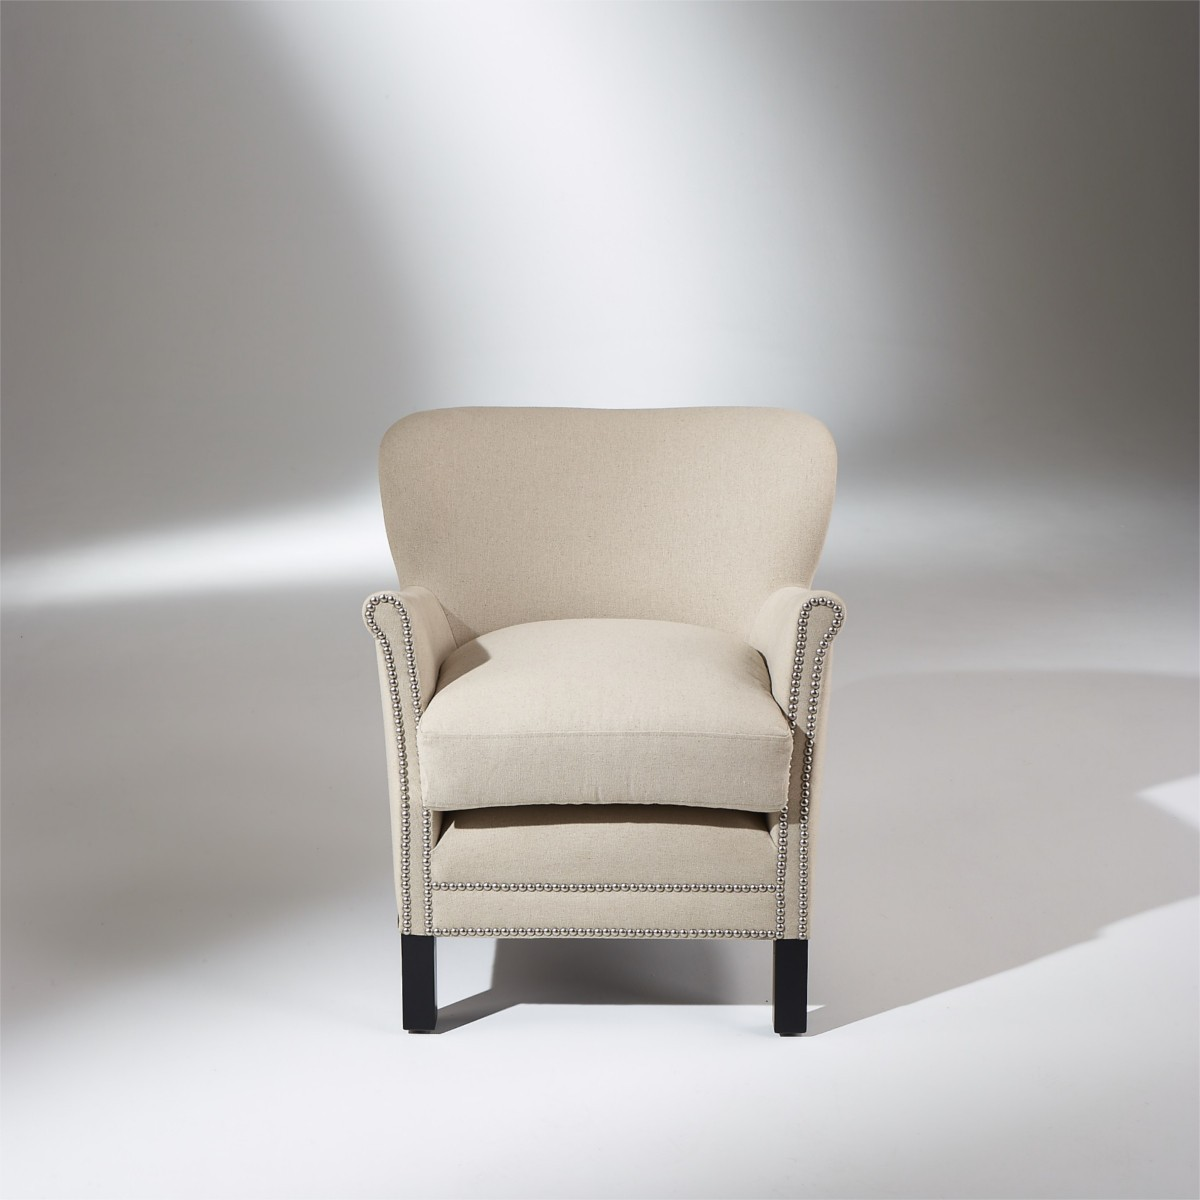 fauteuil confortable et design en lin max. Black Bedroom Furniture Sets. Home Design Ideas